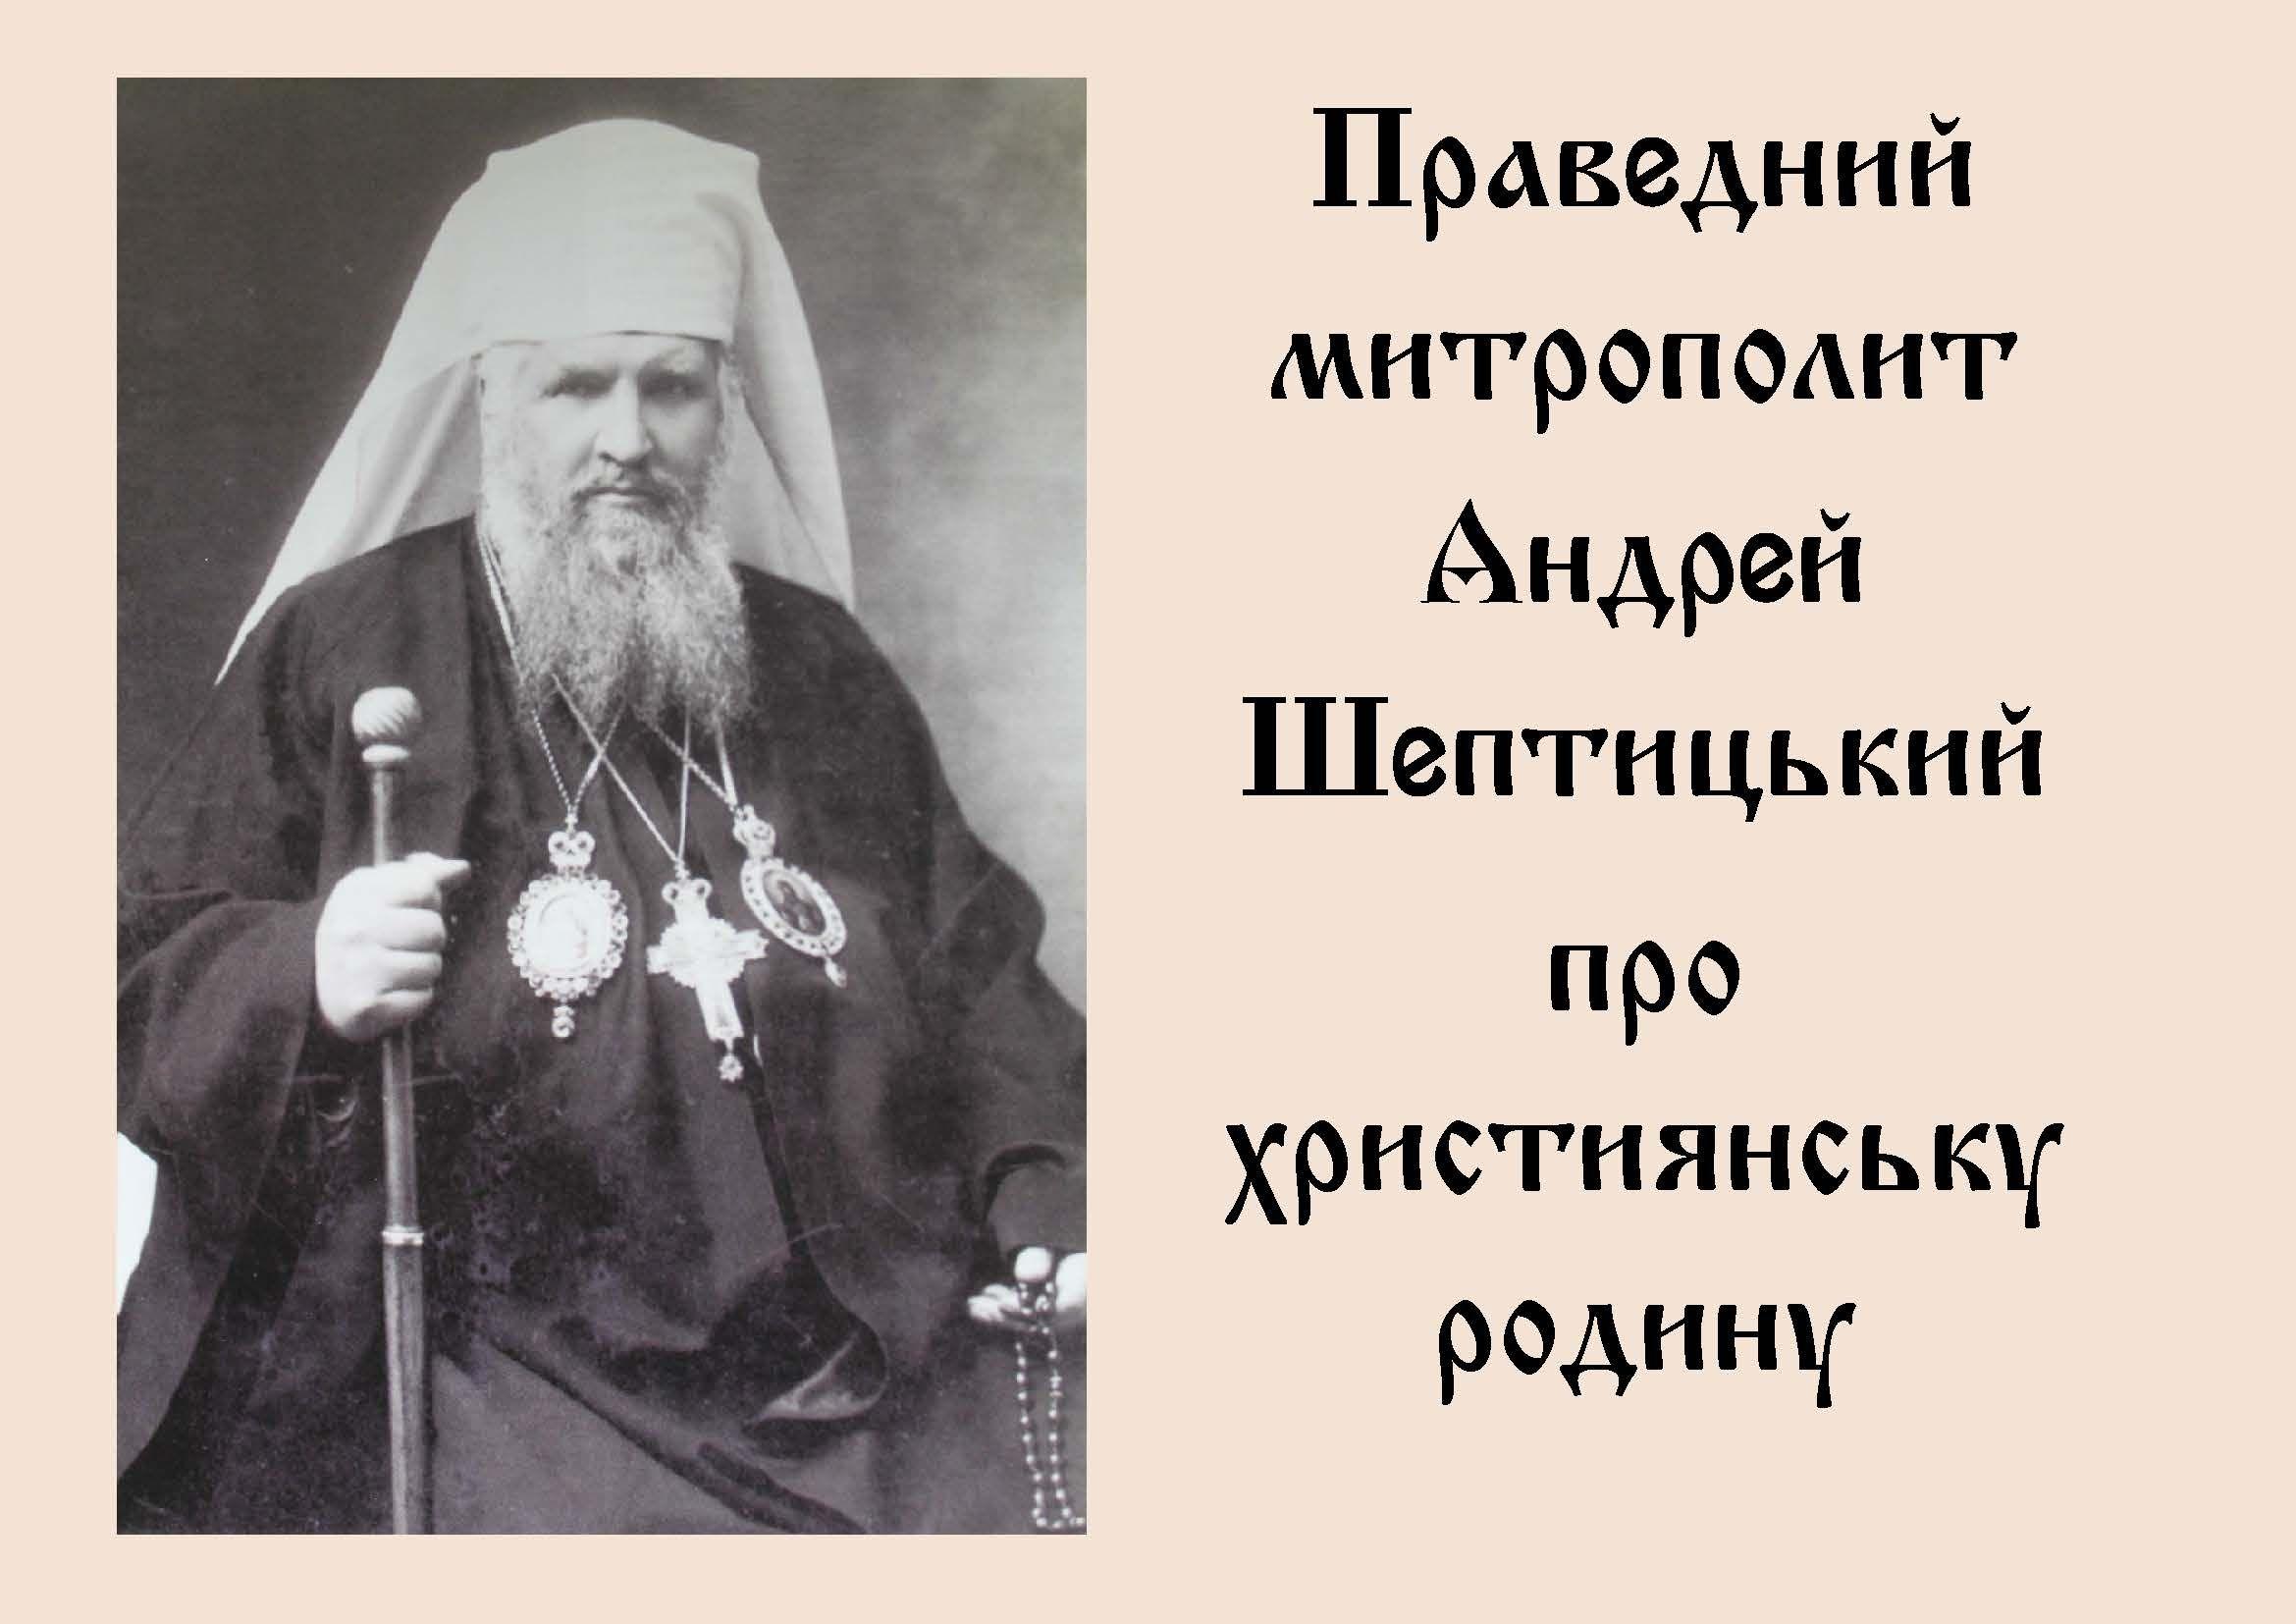 Праведний митрополит Андрей Шептицький про родину як основу християнського життя